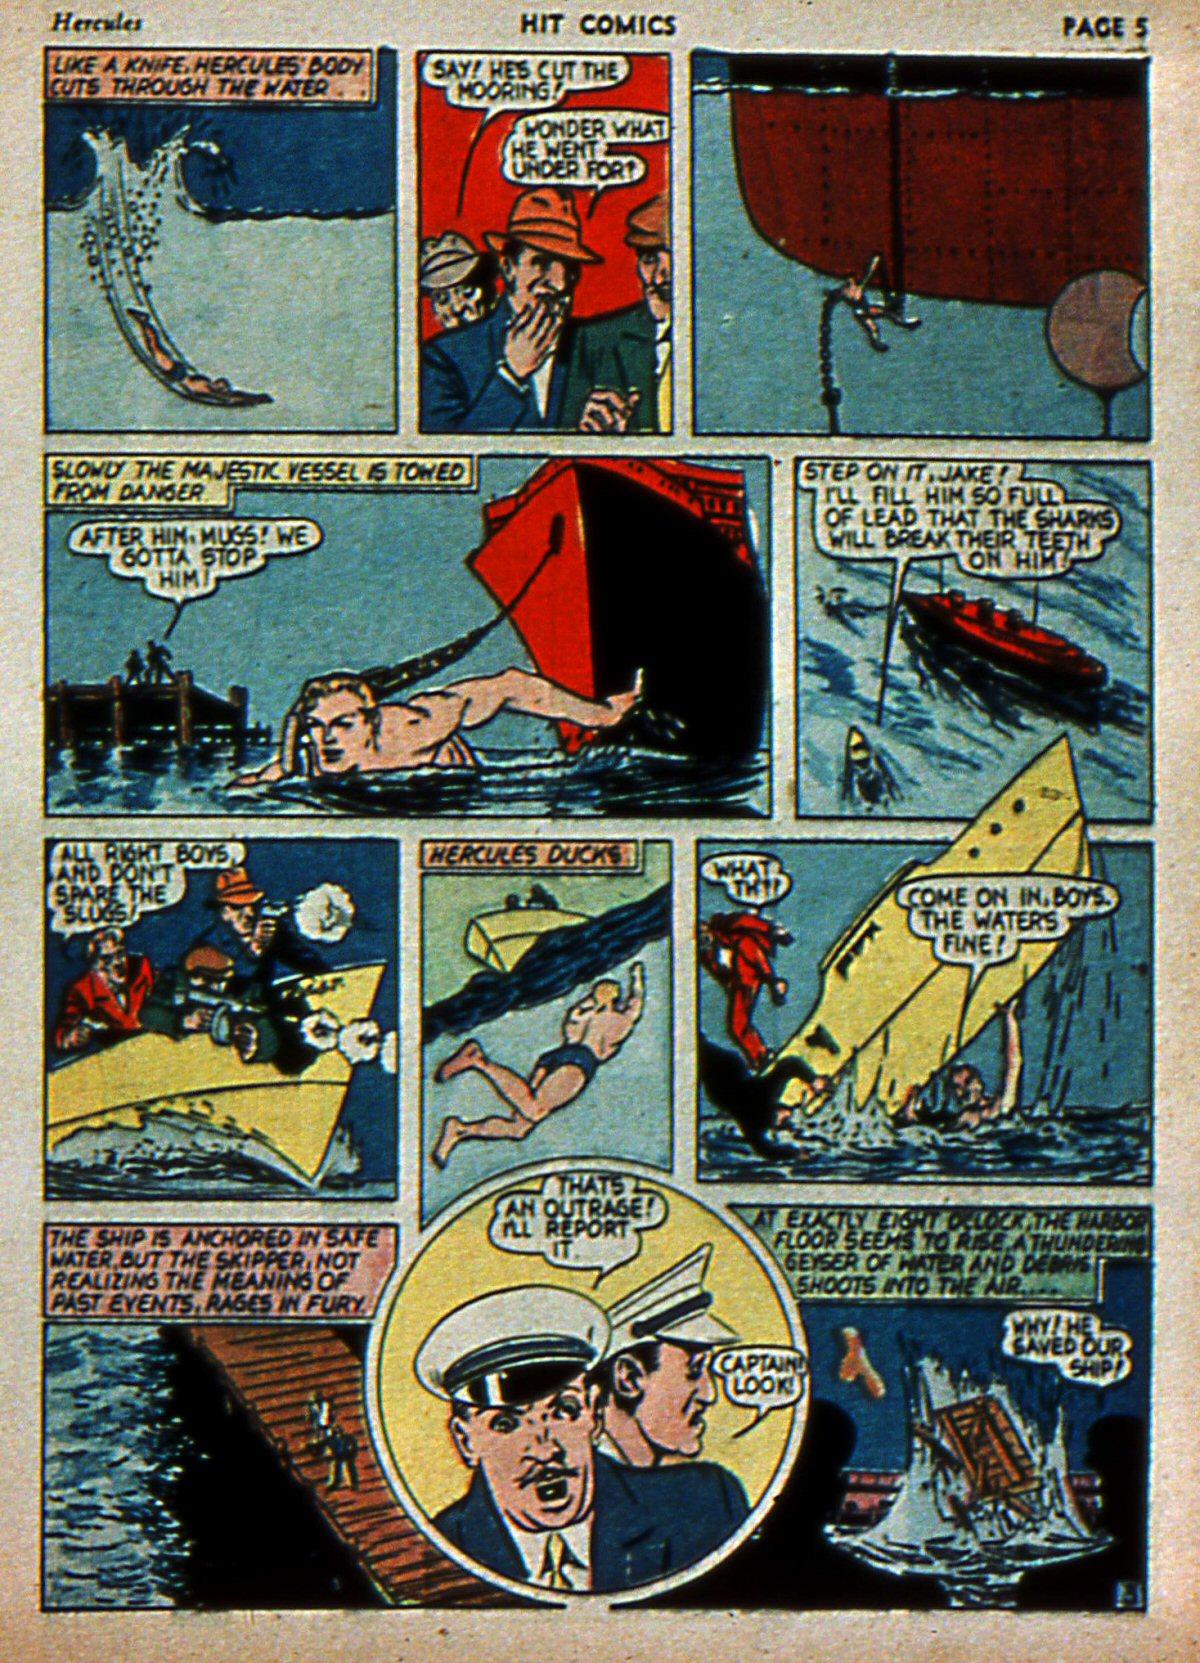 Read online Hit Comics comic -  Issue #3 - 7